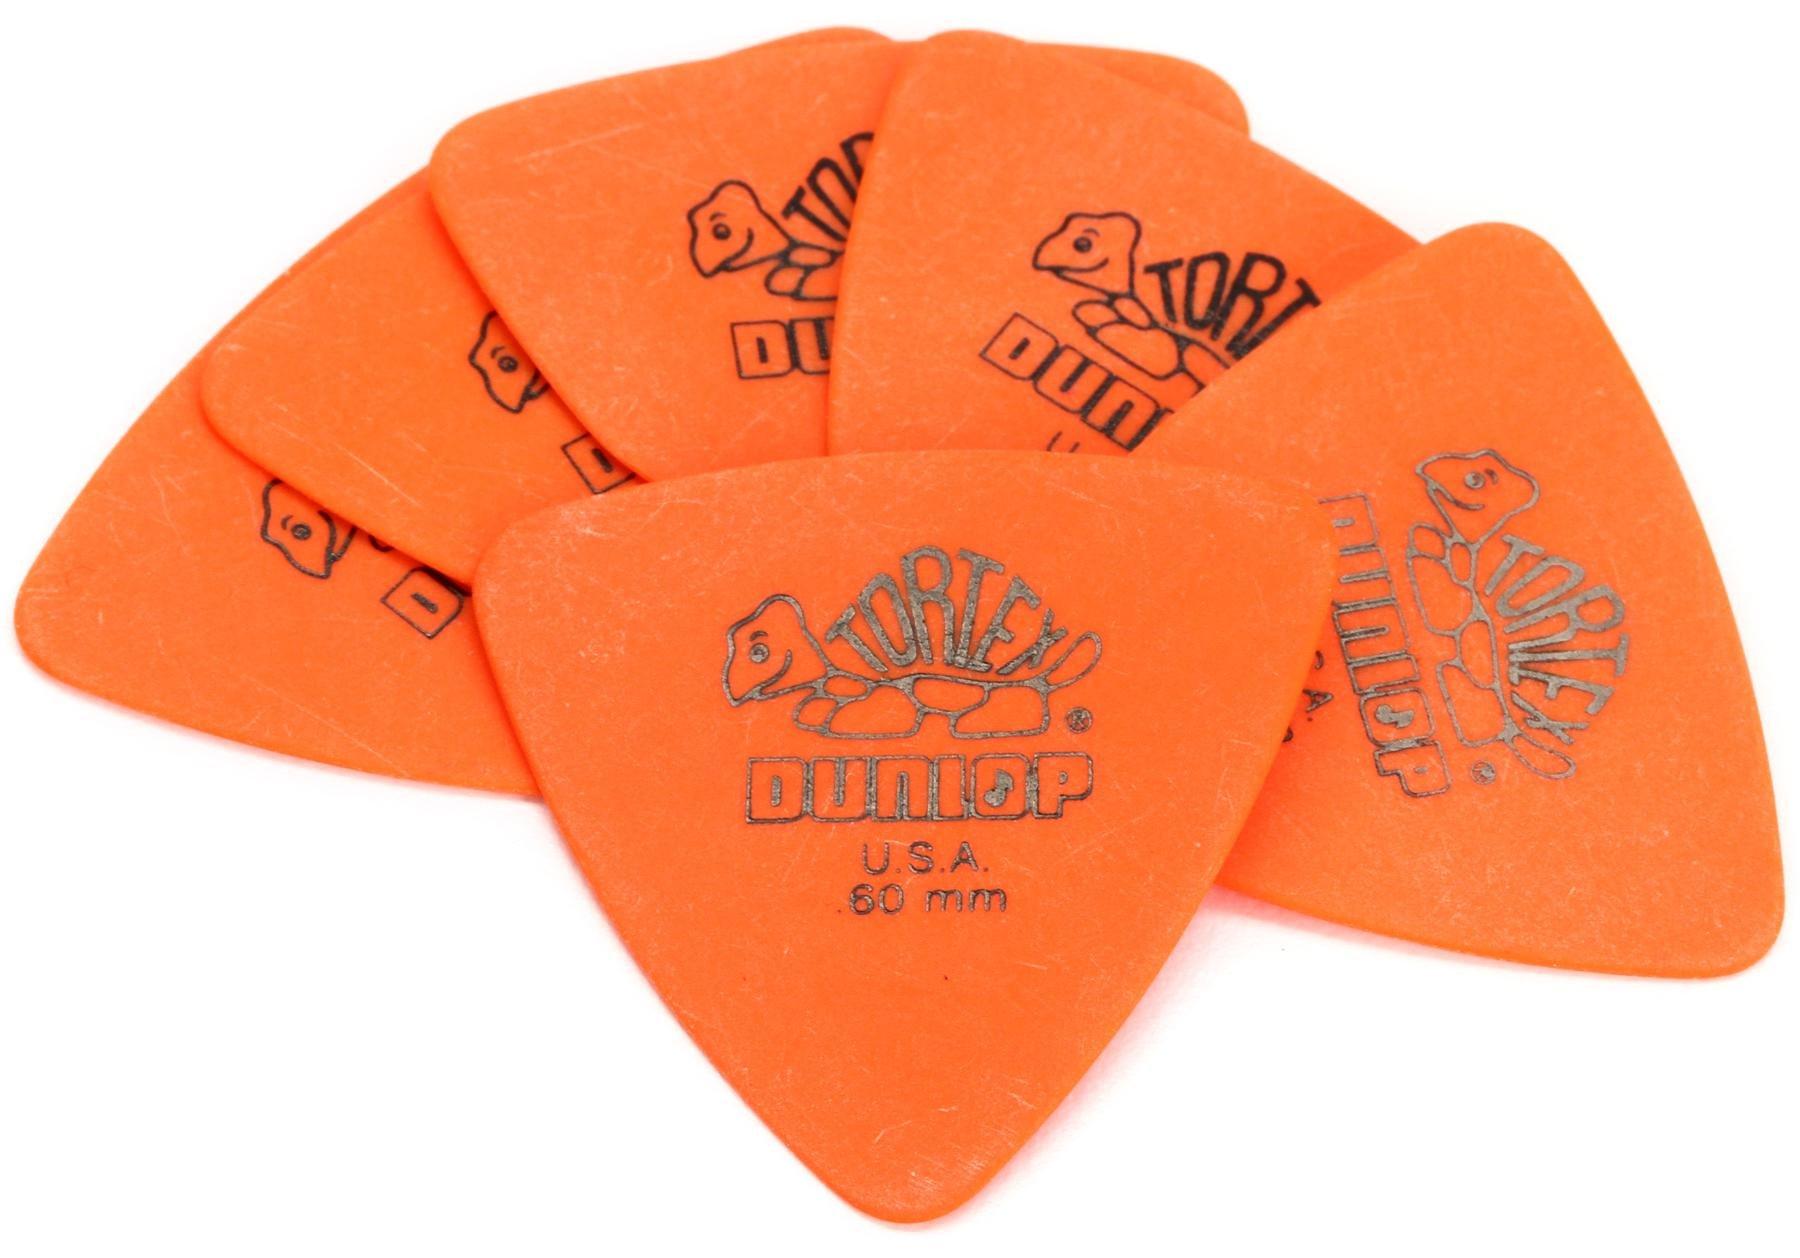 12 x Dunlop Tortex Triangle Picks 431R.73mm YELLOW